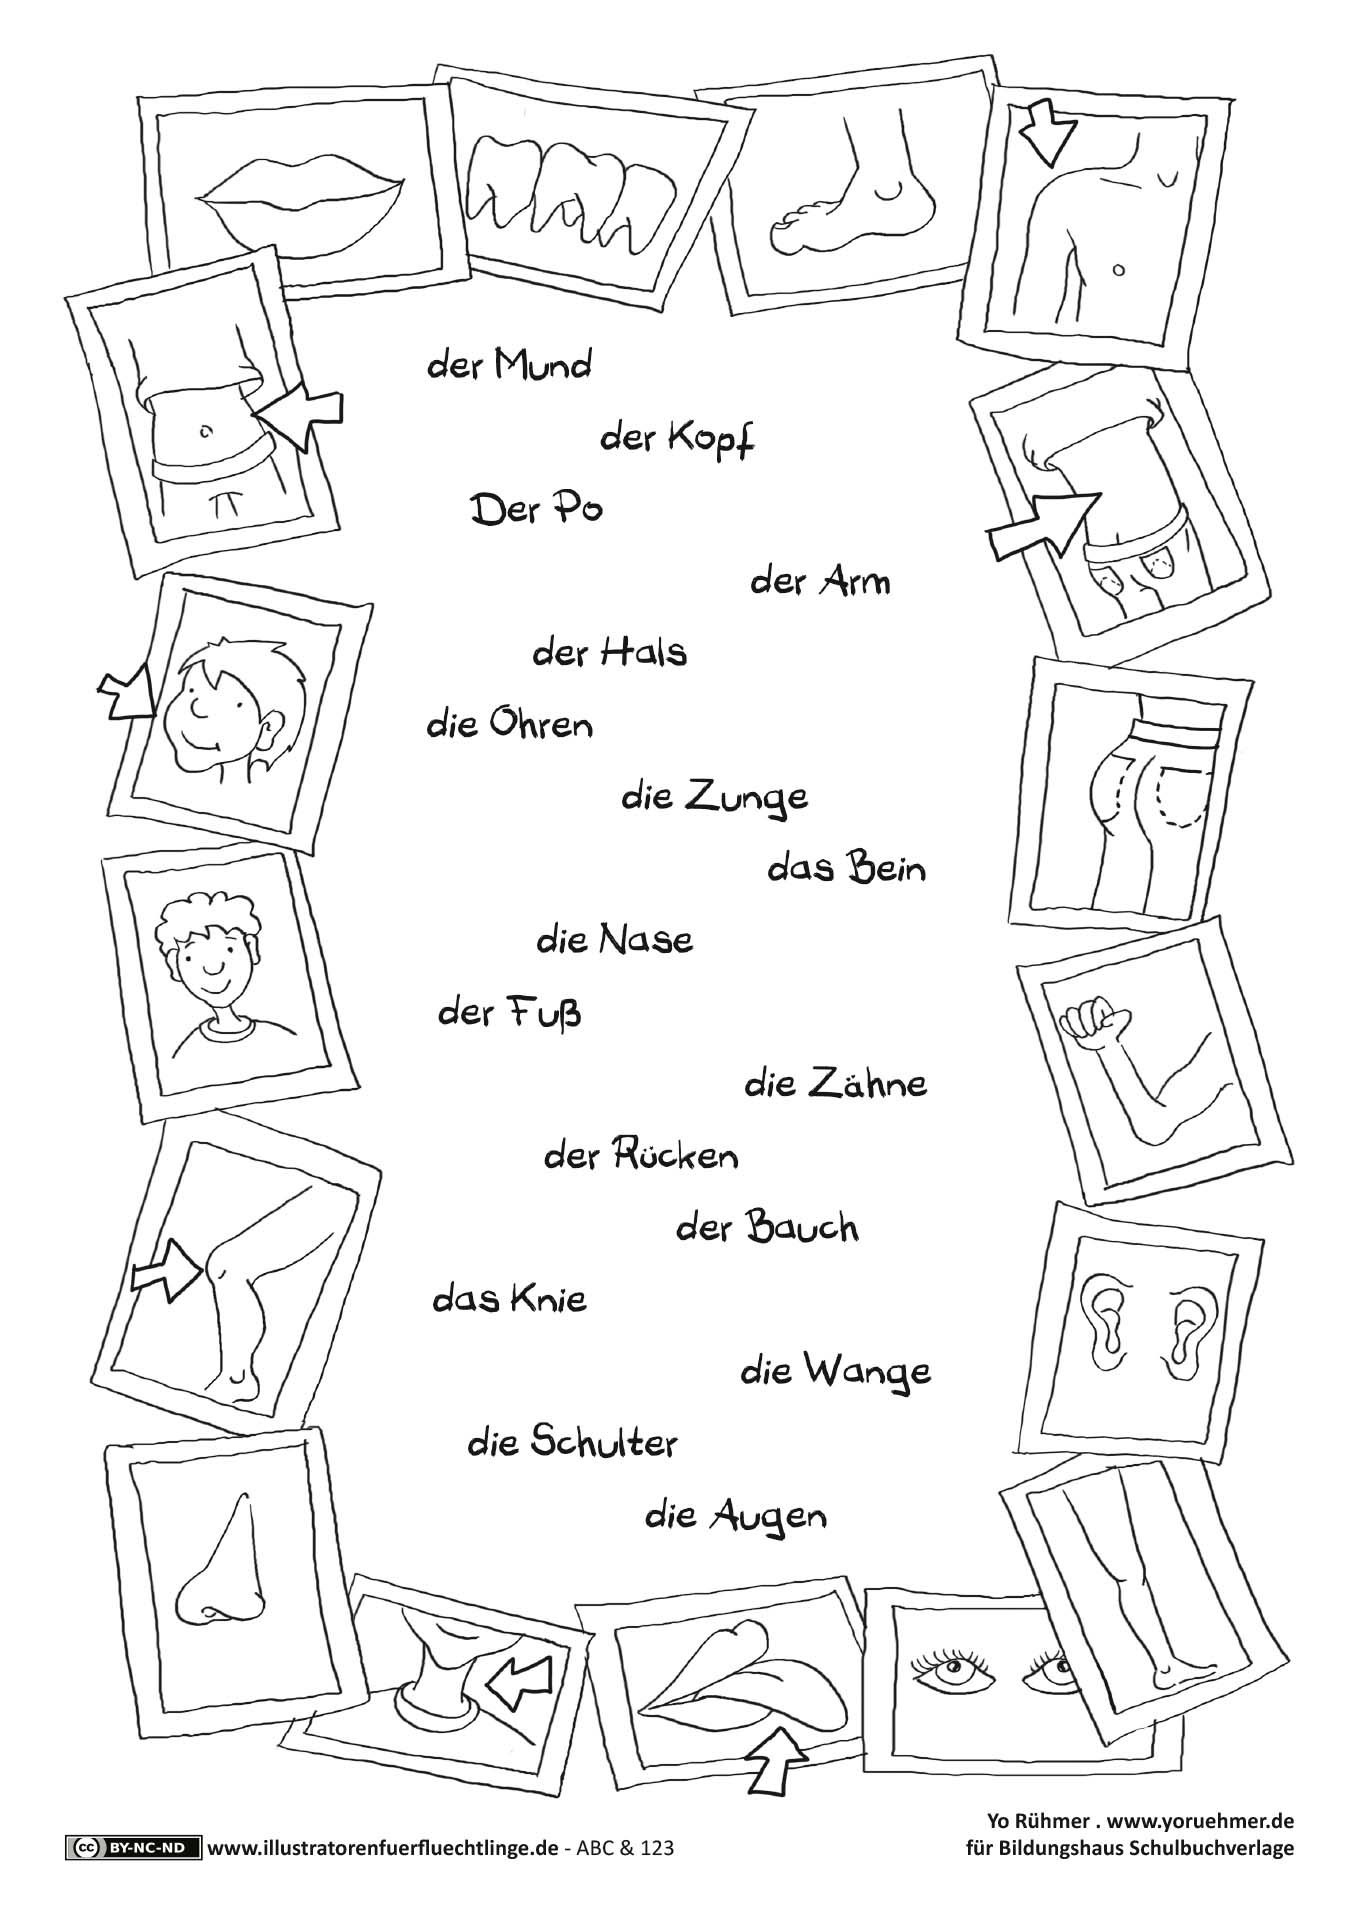 ABC und 123 - Körperteile - Rühmer | Sachunterricht - Mein Körper ...